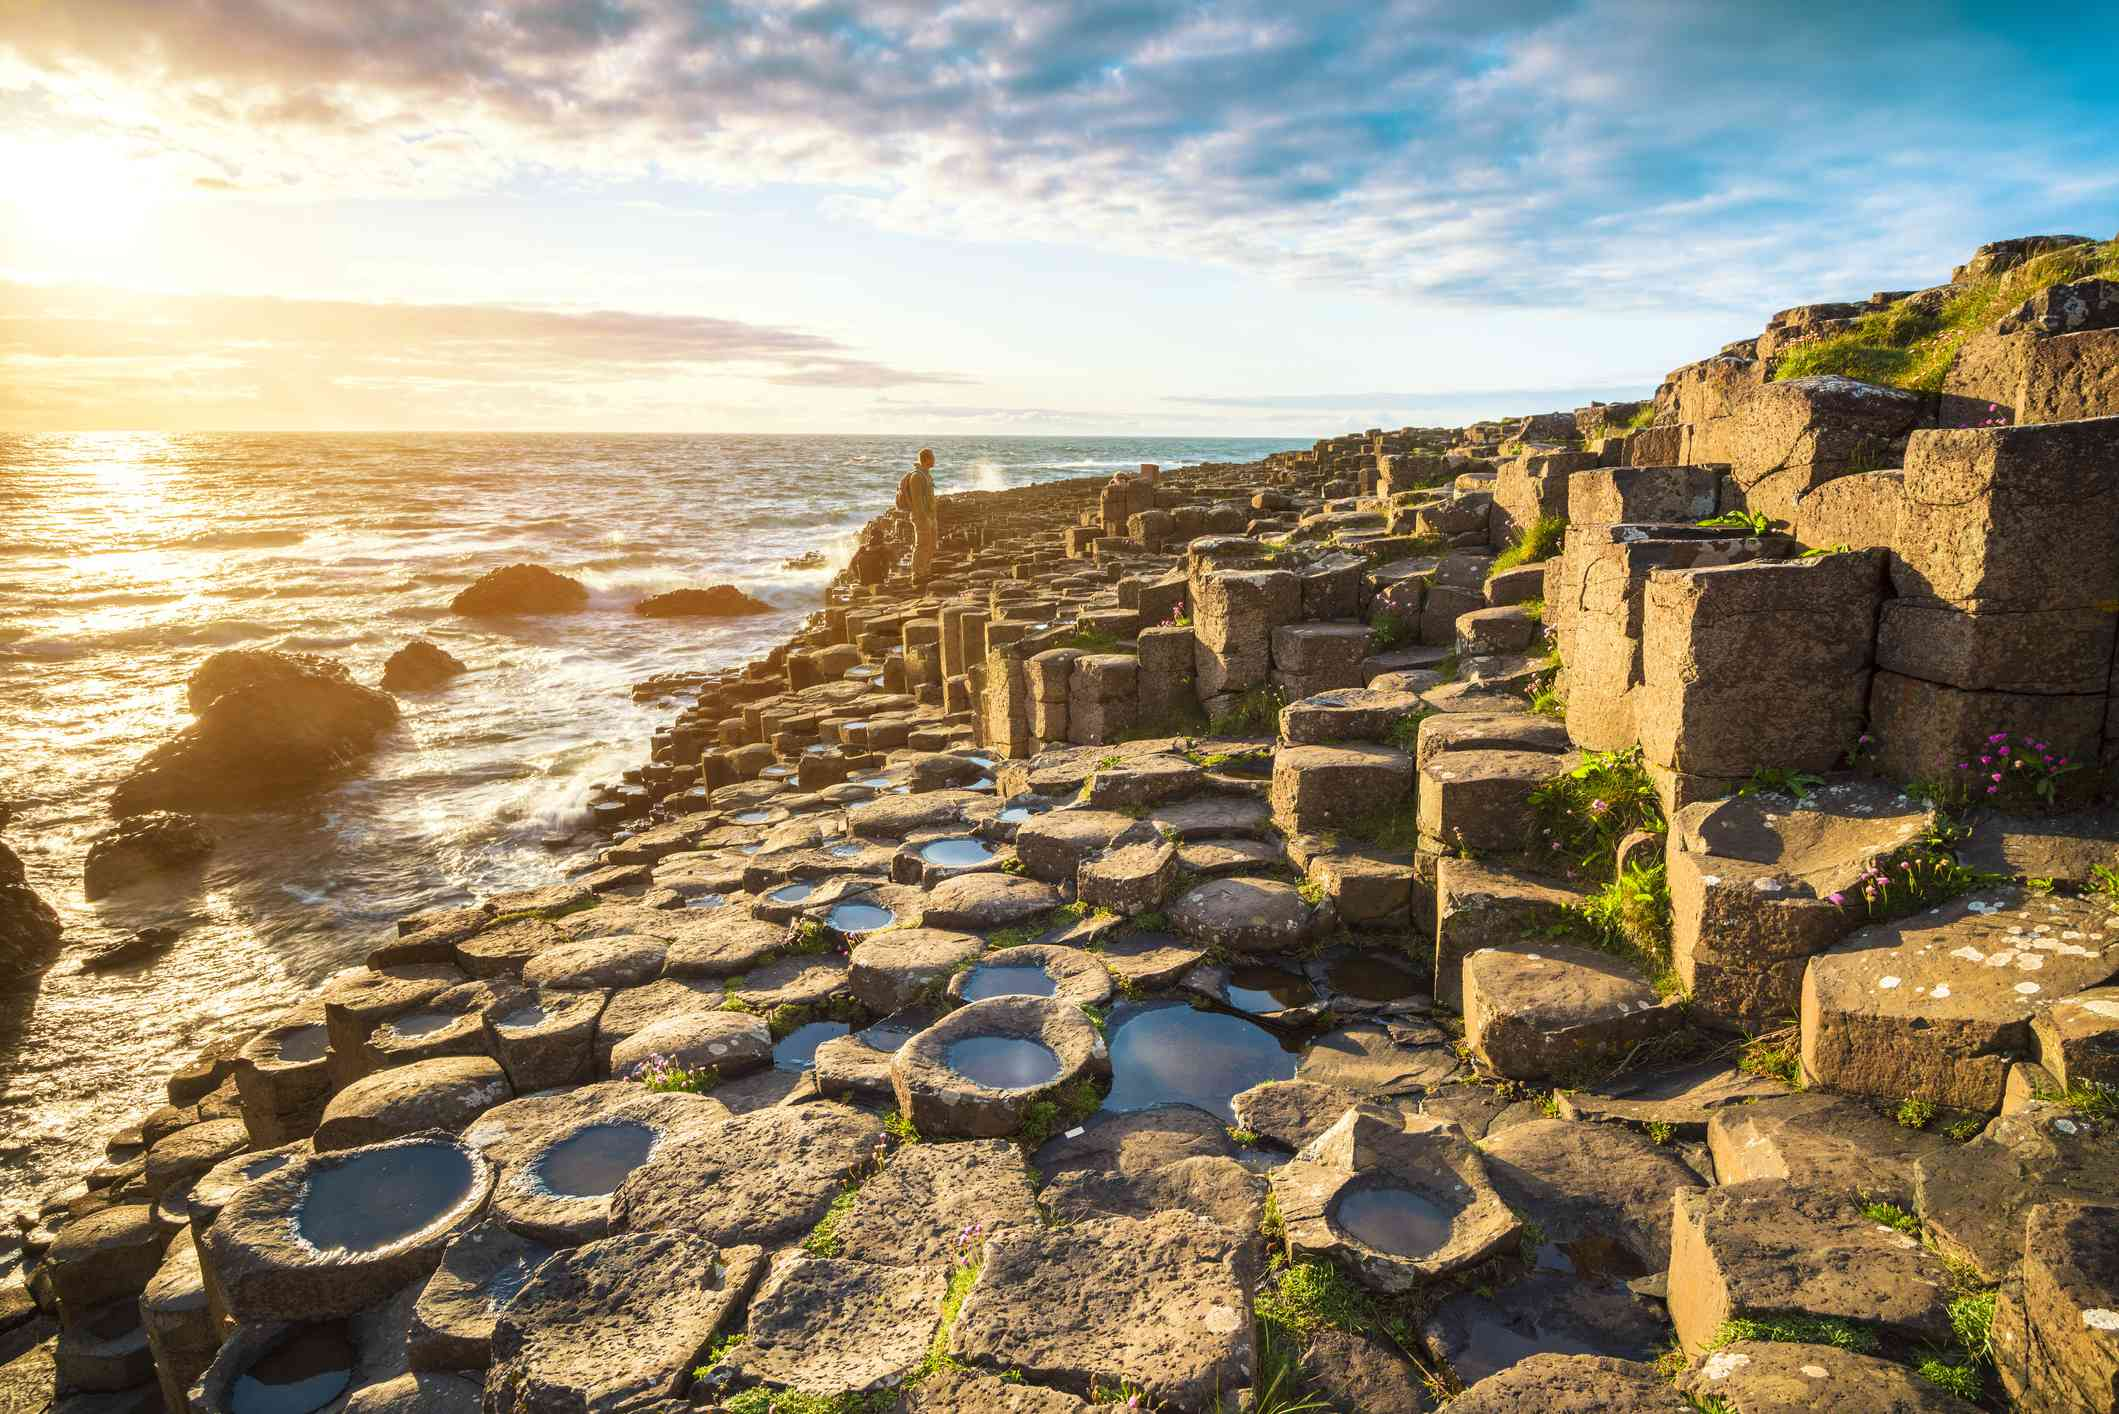 Iconic basalt columns called Giants Causeway